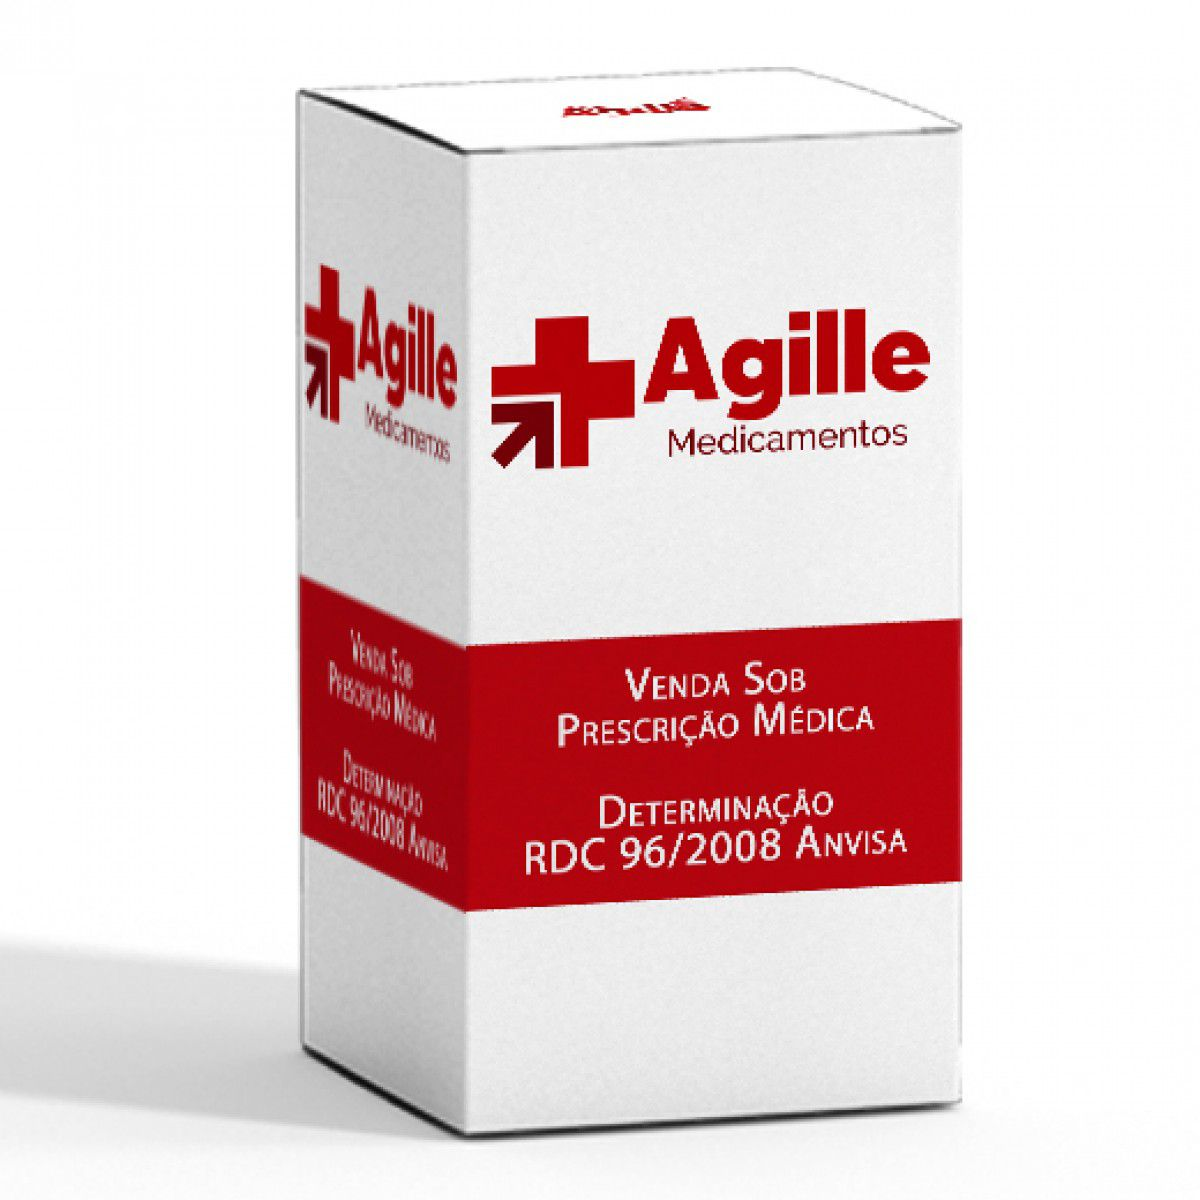 ENOXALOW 40MG C/10 SER. PREENC. SIST.SEGURANÇA  - Agille Speciality